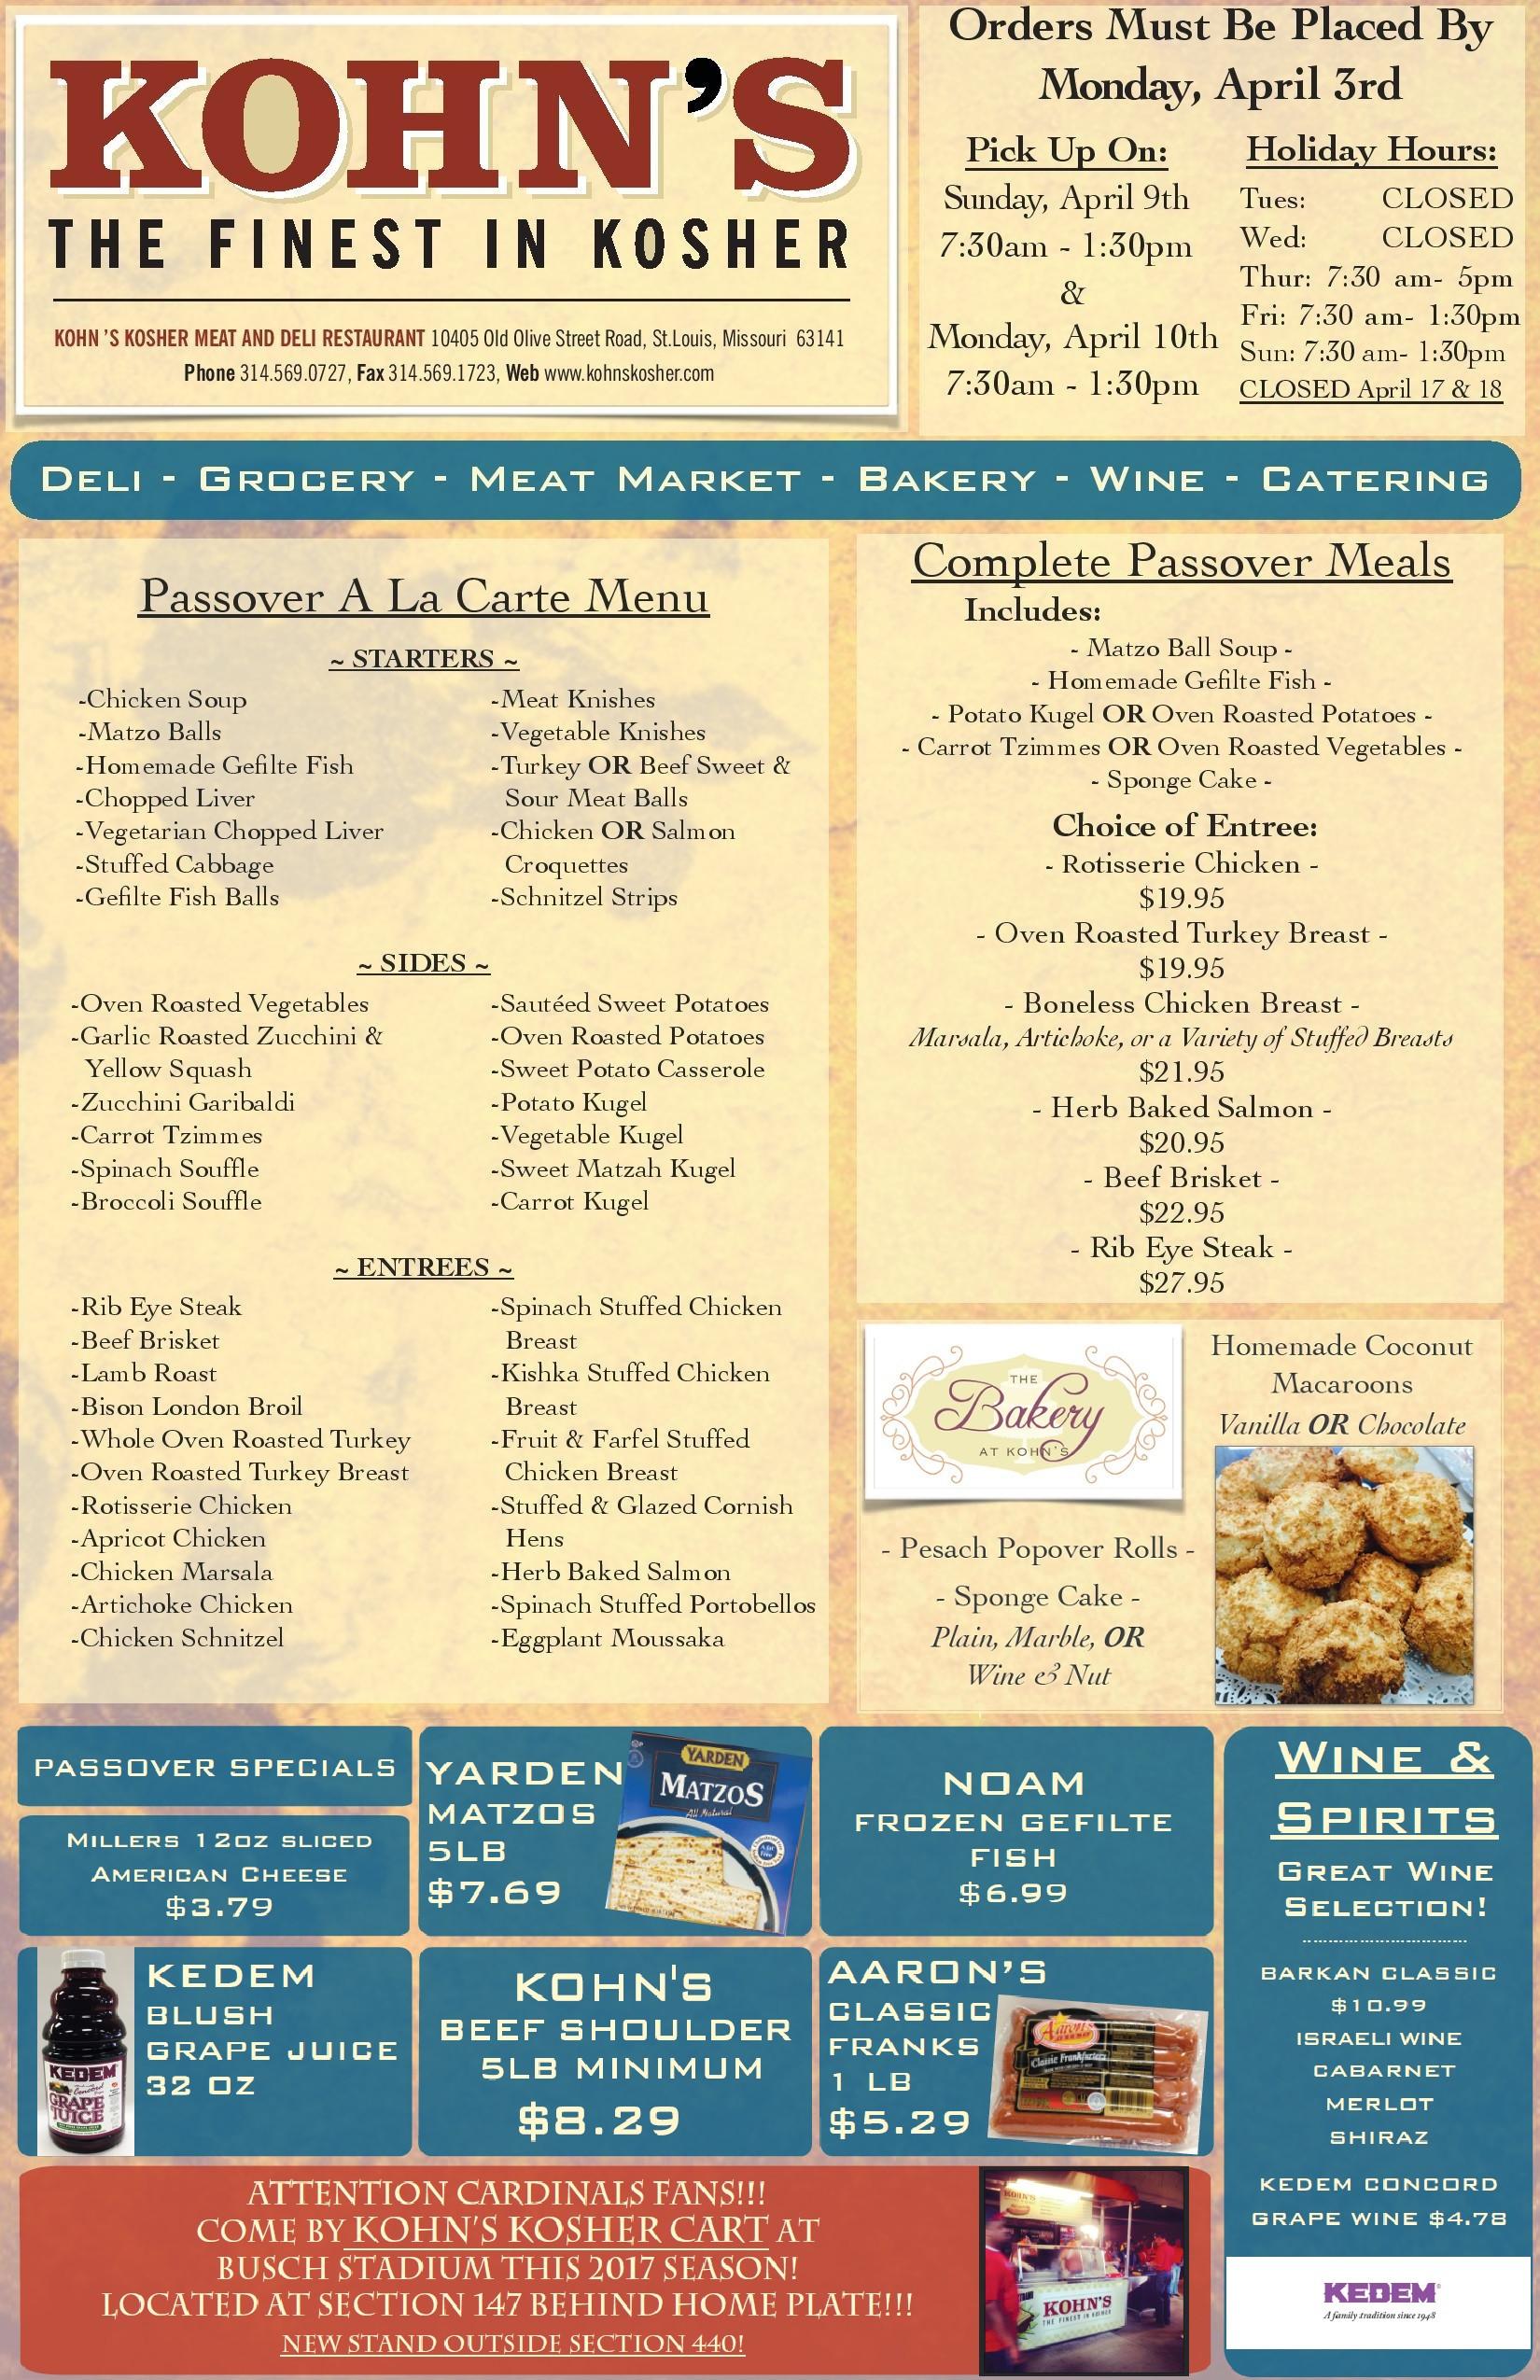 Passover Dinner Menus  Passover Menu Kohn s Restaurant & Deli The Finest in